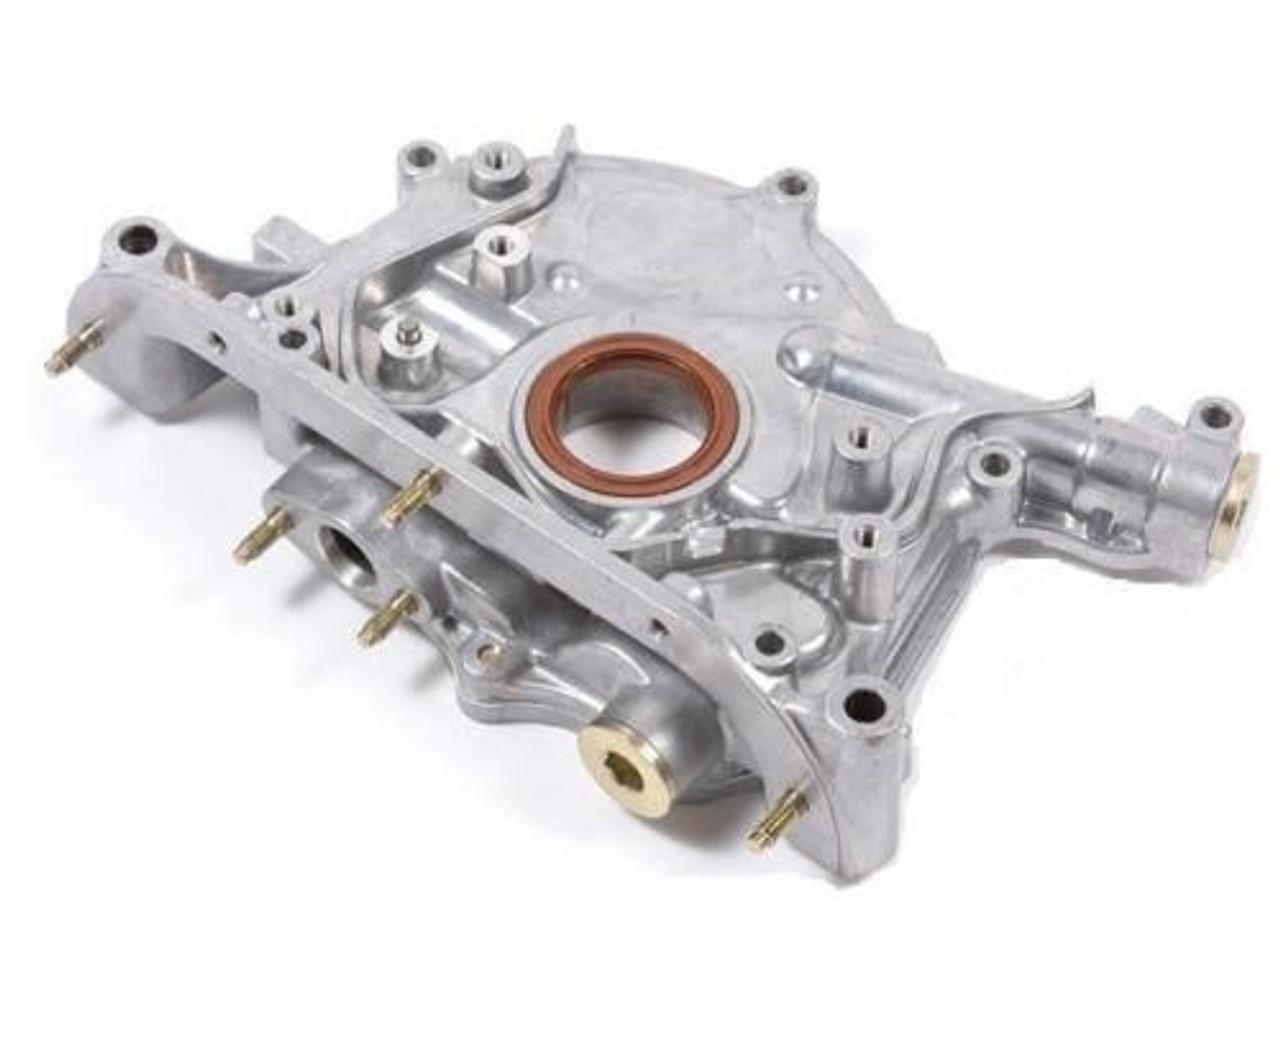 4Piston - Ported B-Series Oil Pump